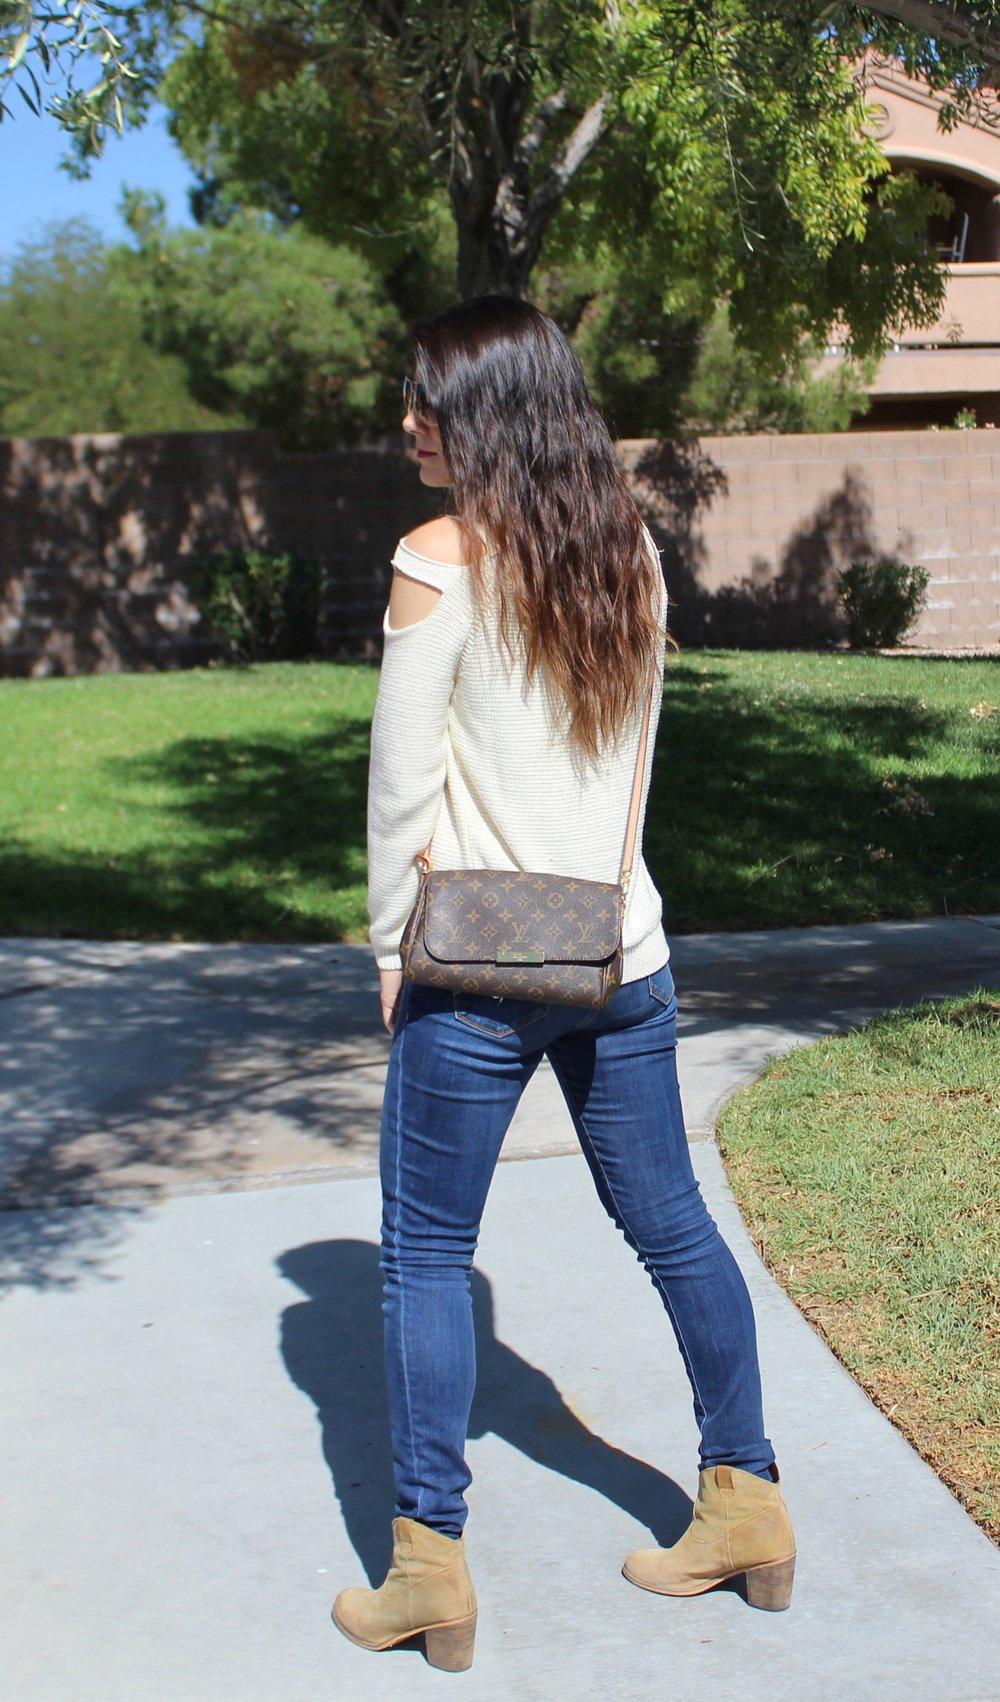 falloutfit,autumoutfit,fashion,style,sweater,cutoutsweater,jeans,denim,louisvuitton,bag,blogger,lasvegas,lasvegasblogger